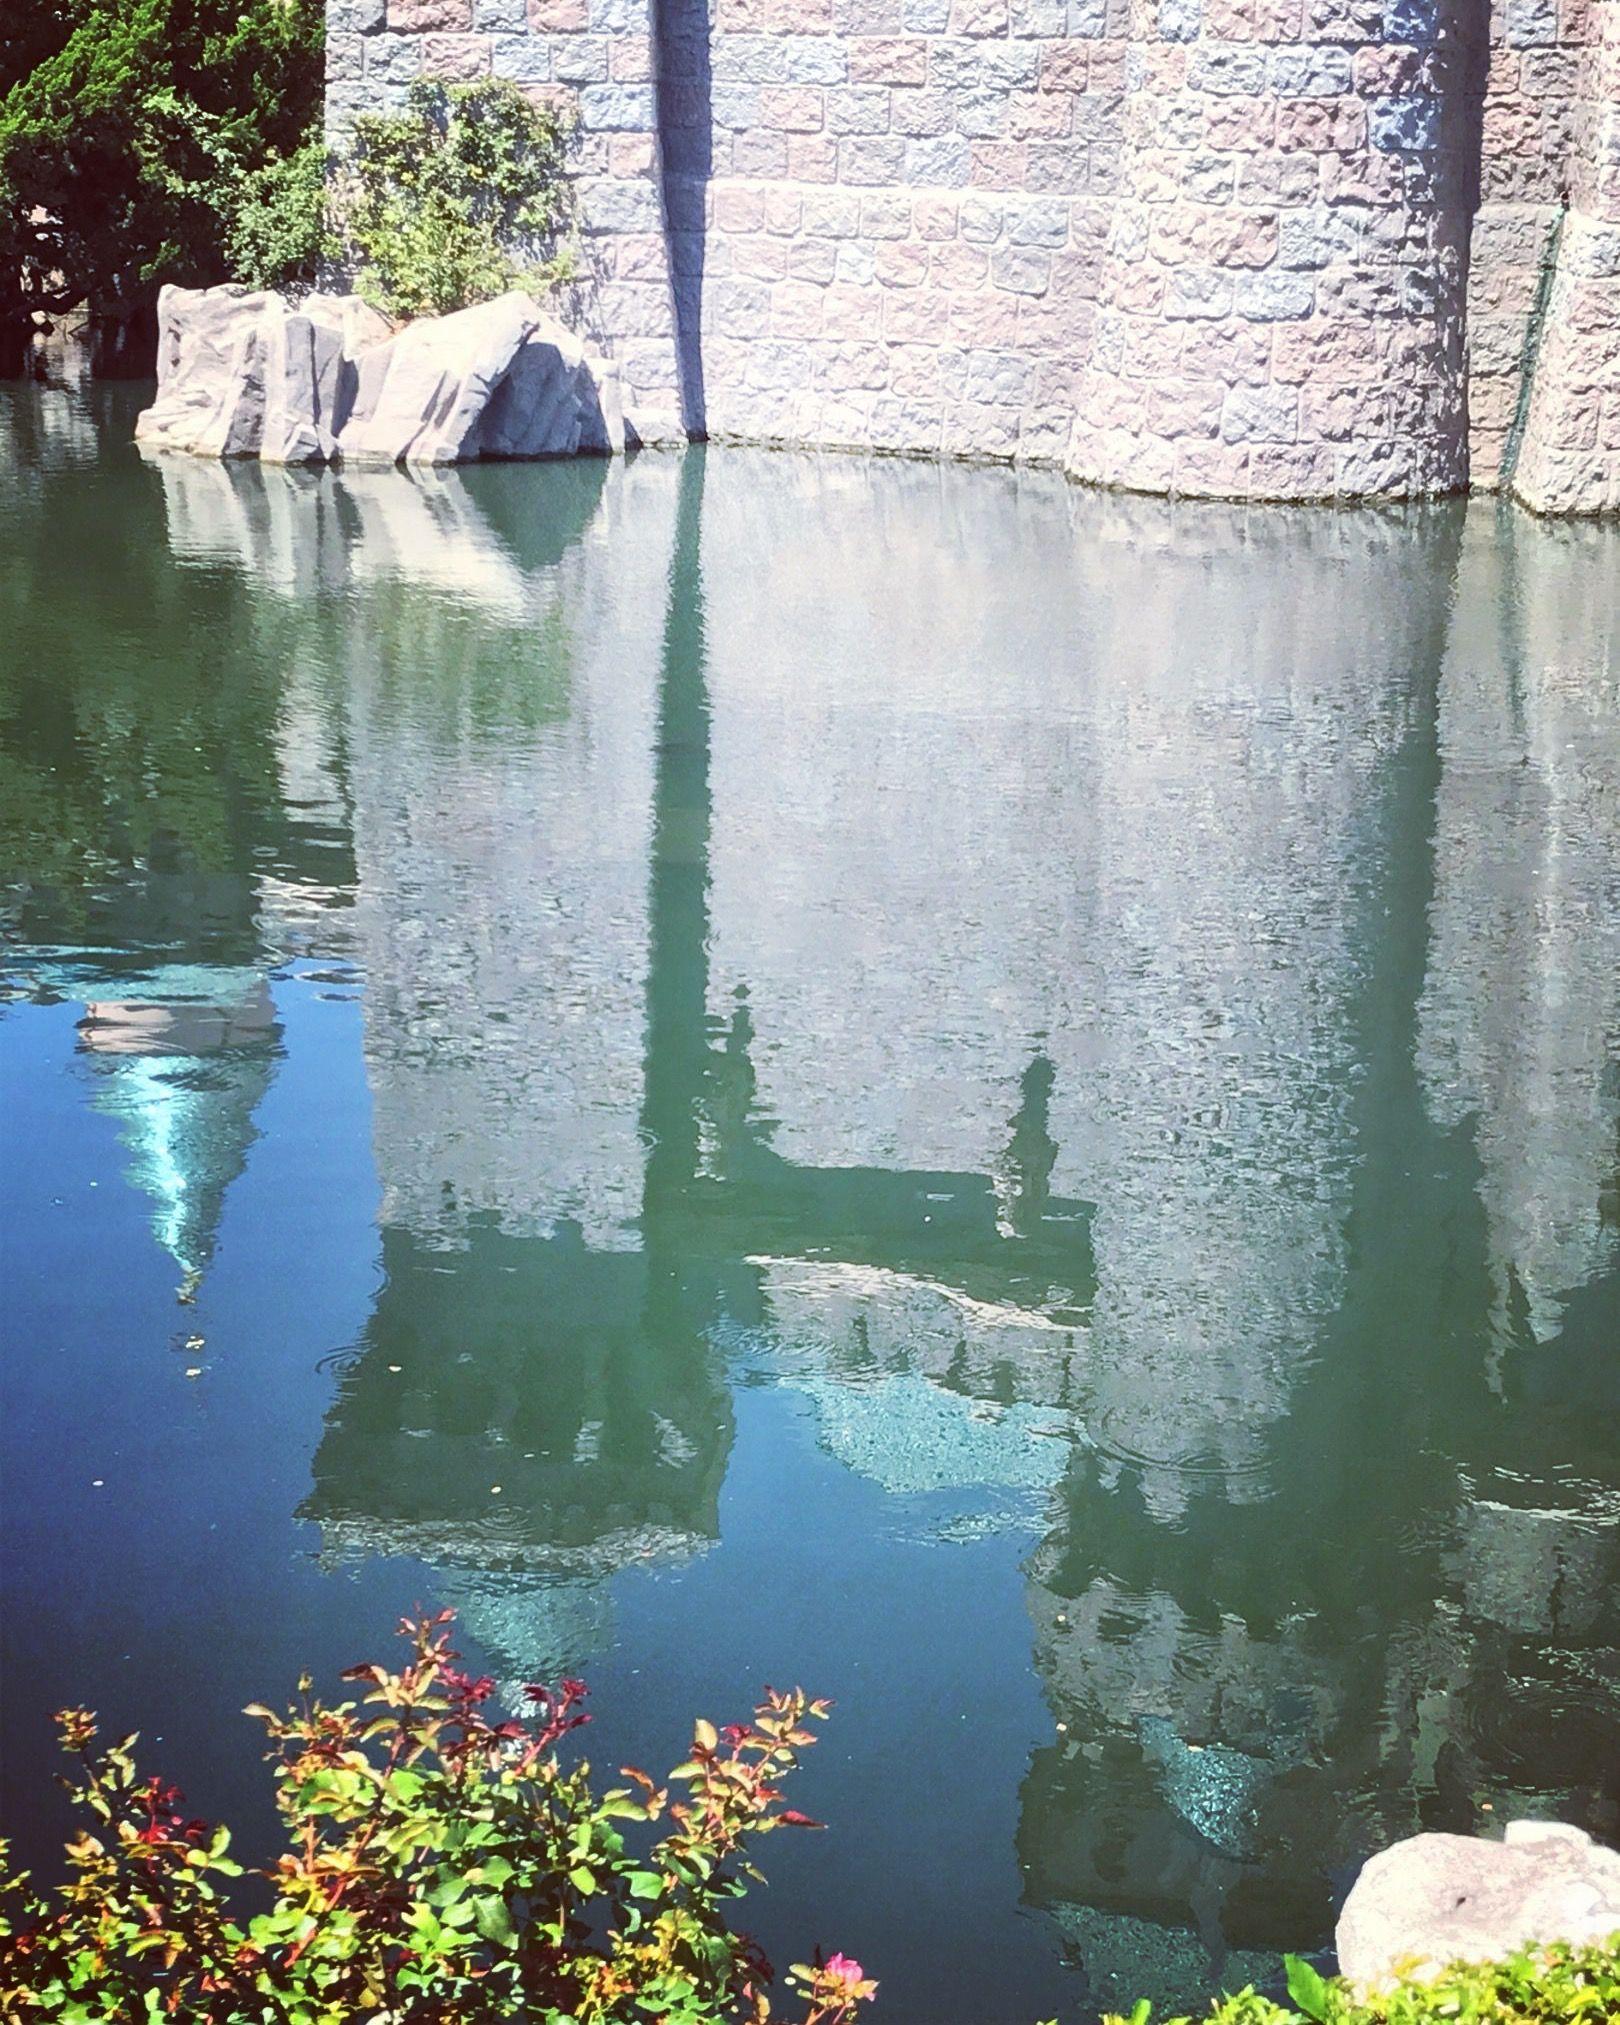 Castle moat Disneyland photography, Disneyland resort